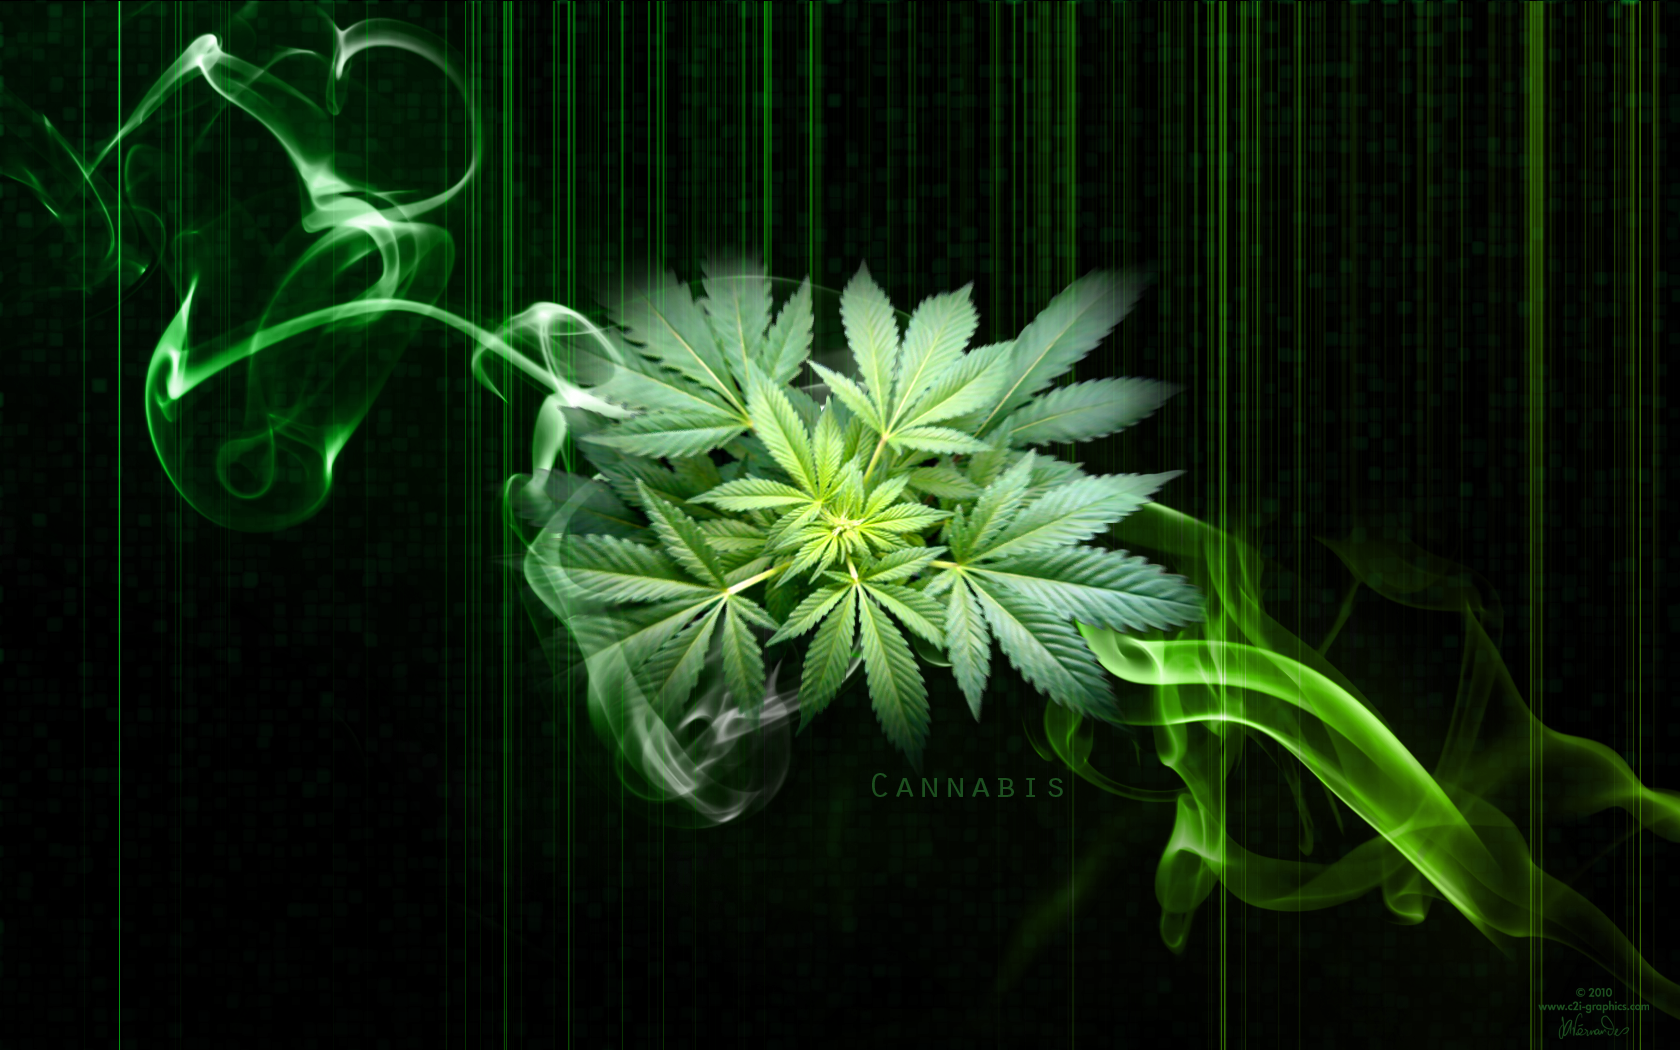 marijuana wallpaper 1680x1050 - photo #3